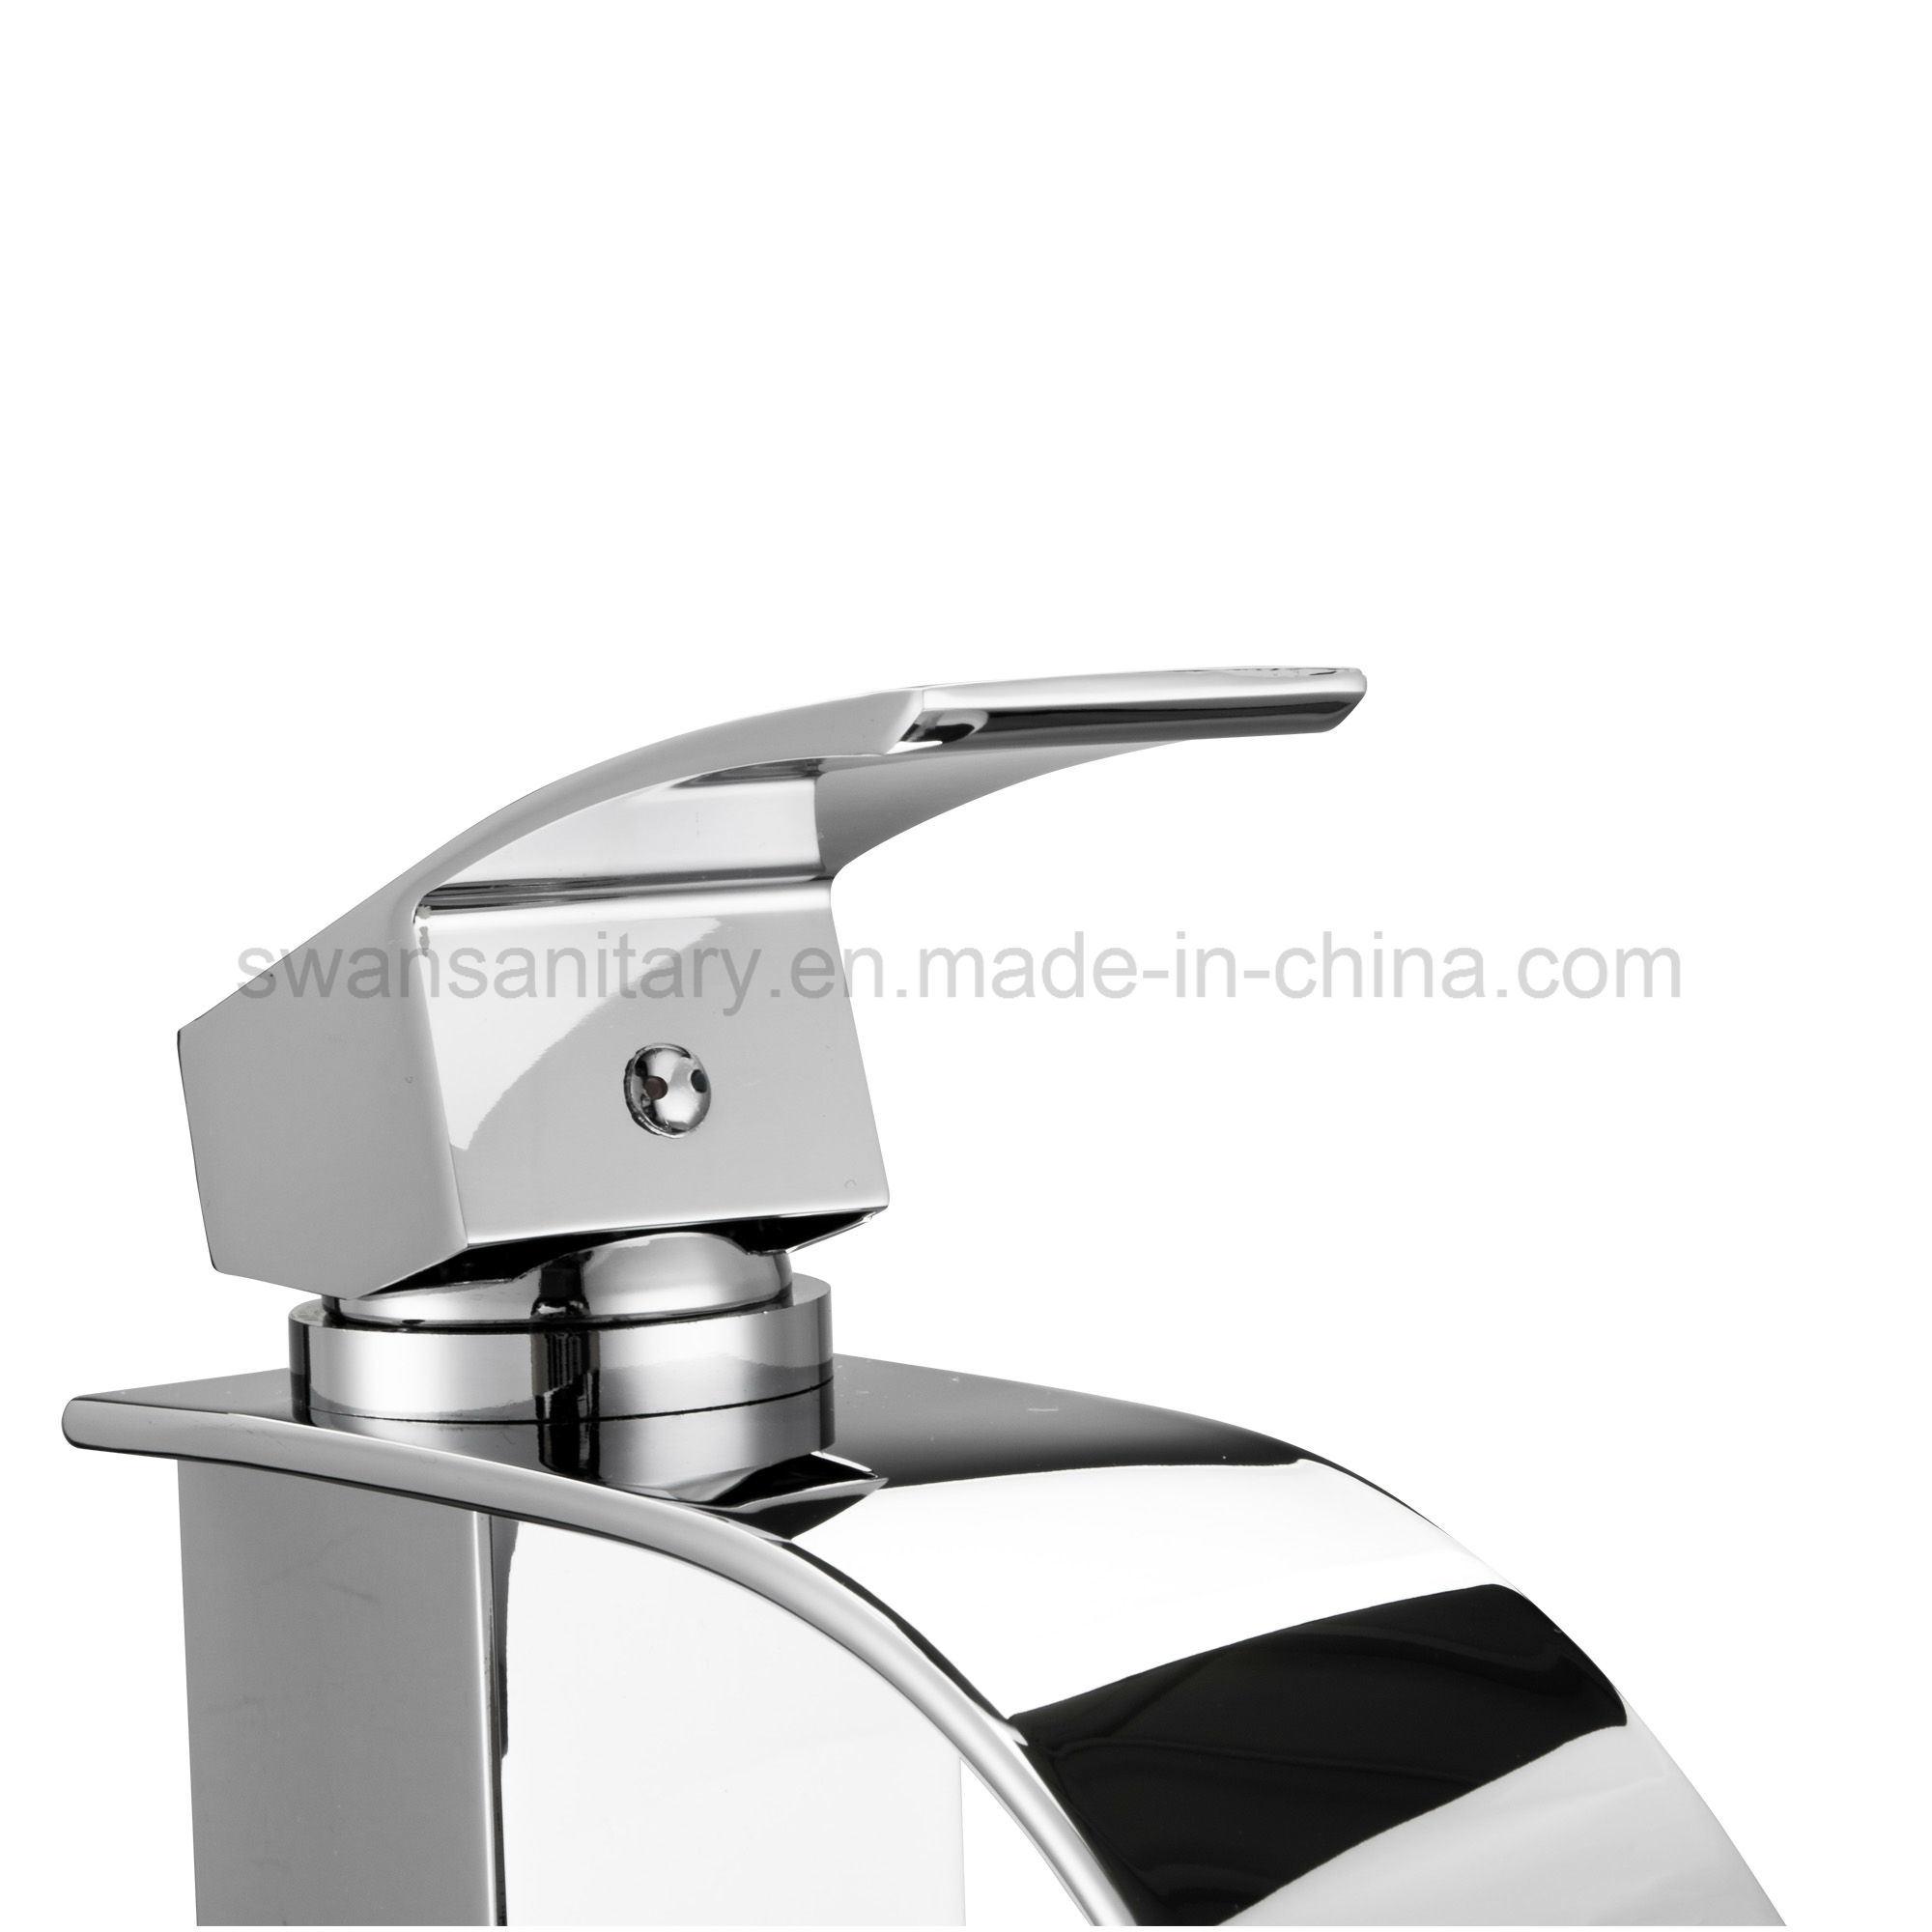 Kaen Wide Spout Waterfall Basin Faucet